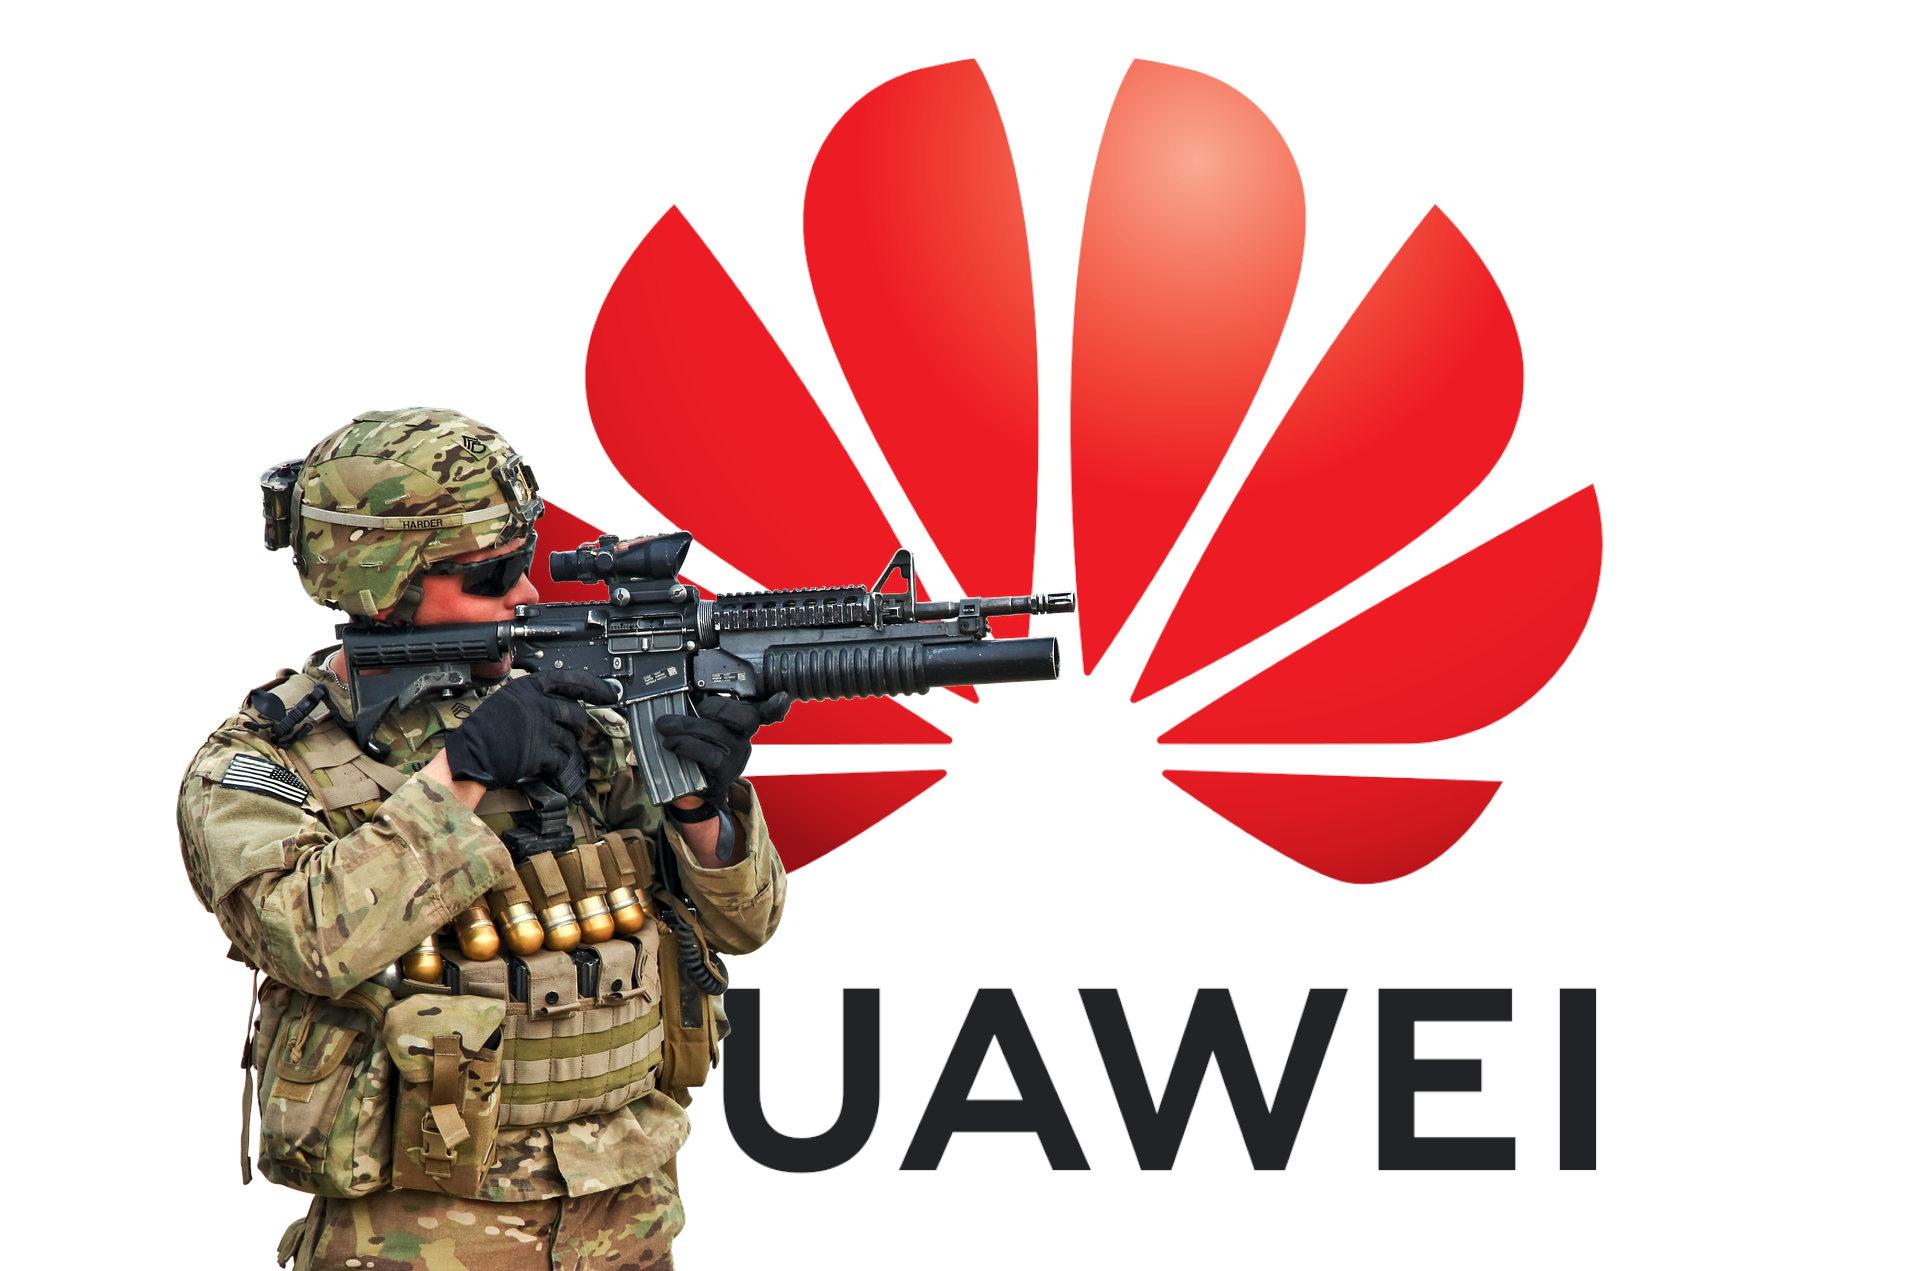 America gegen Huawei - Wie unsicher ist America nun?